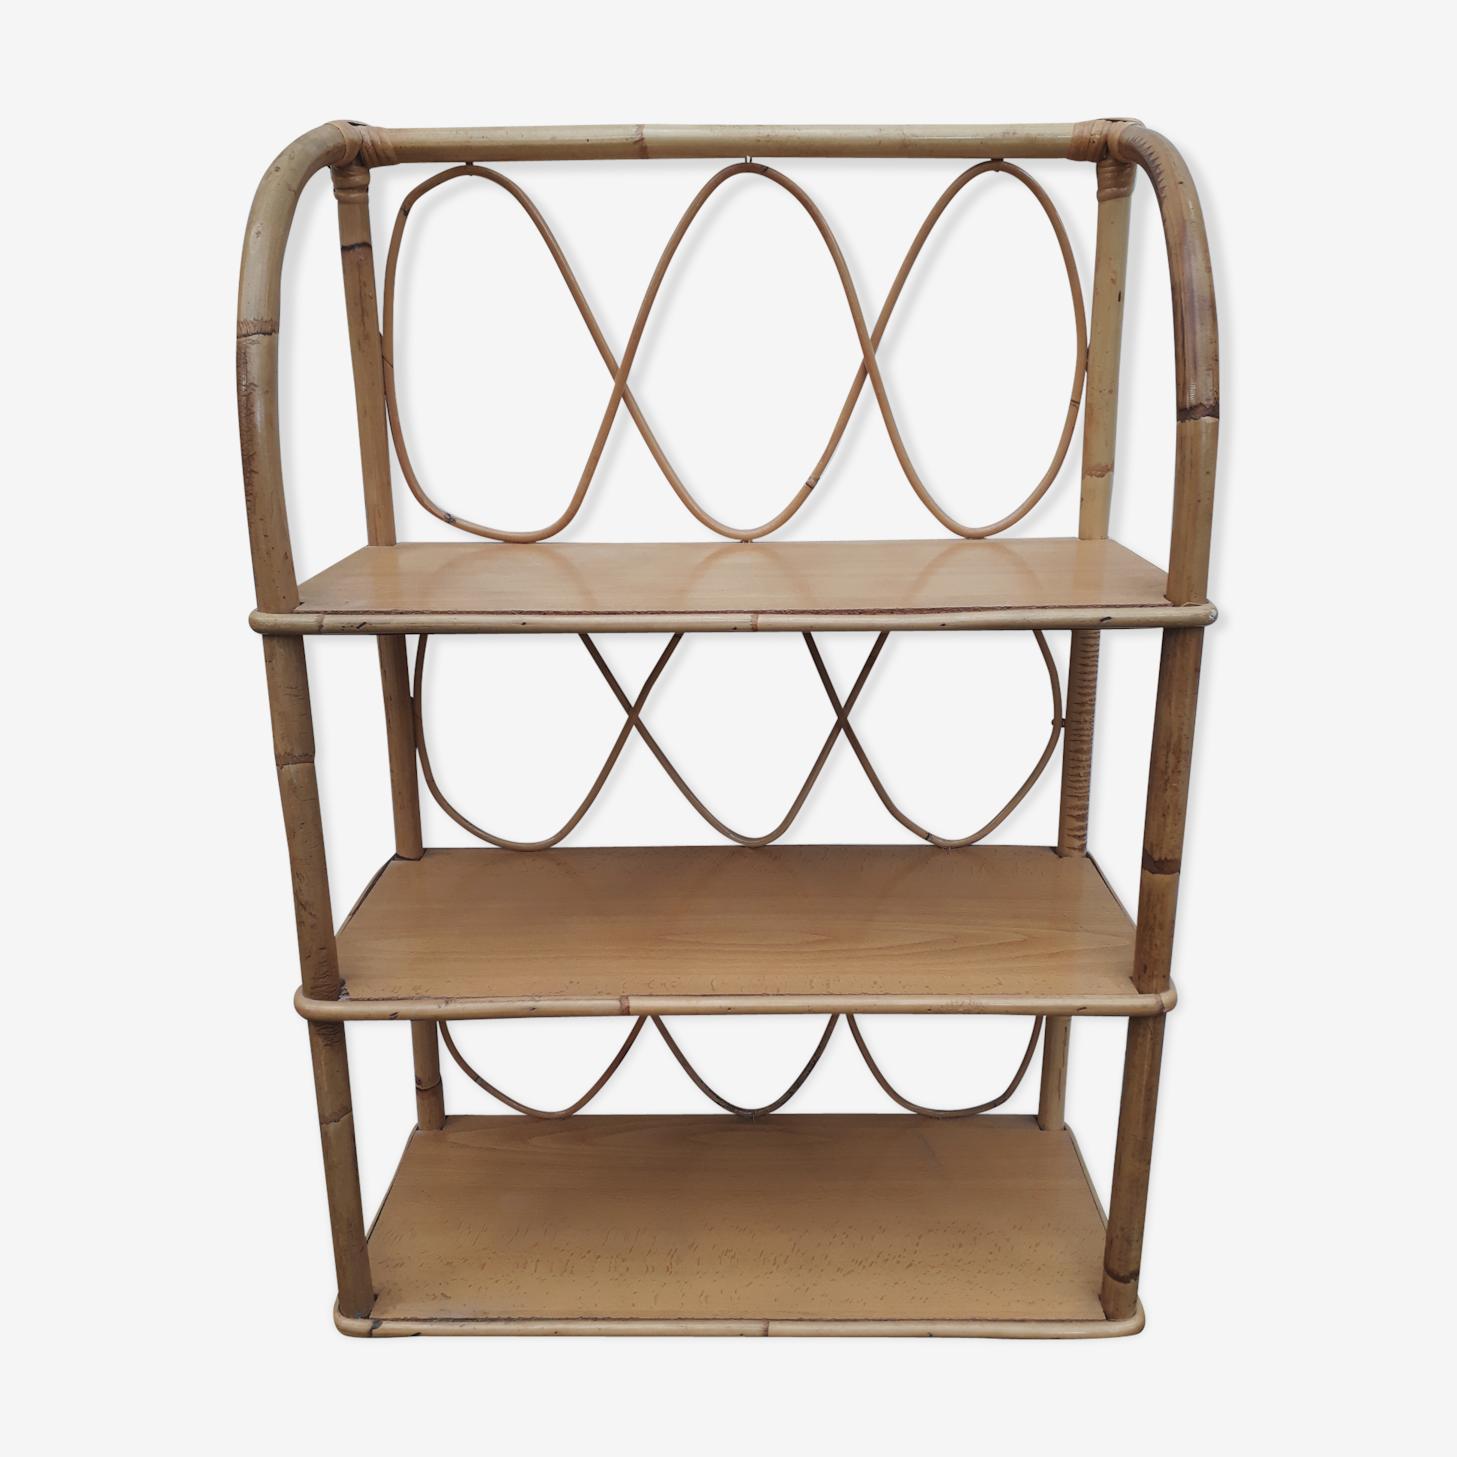 Rattan shelf of the 70s